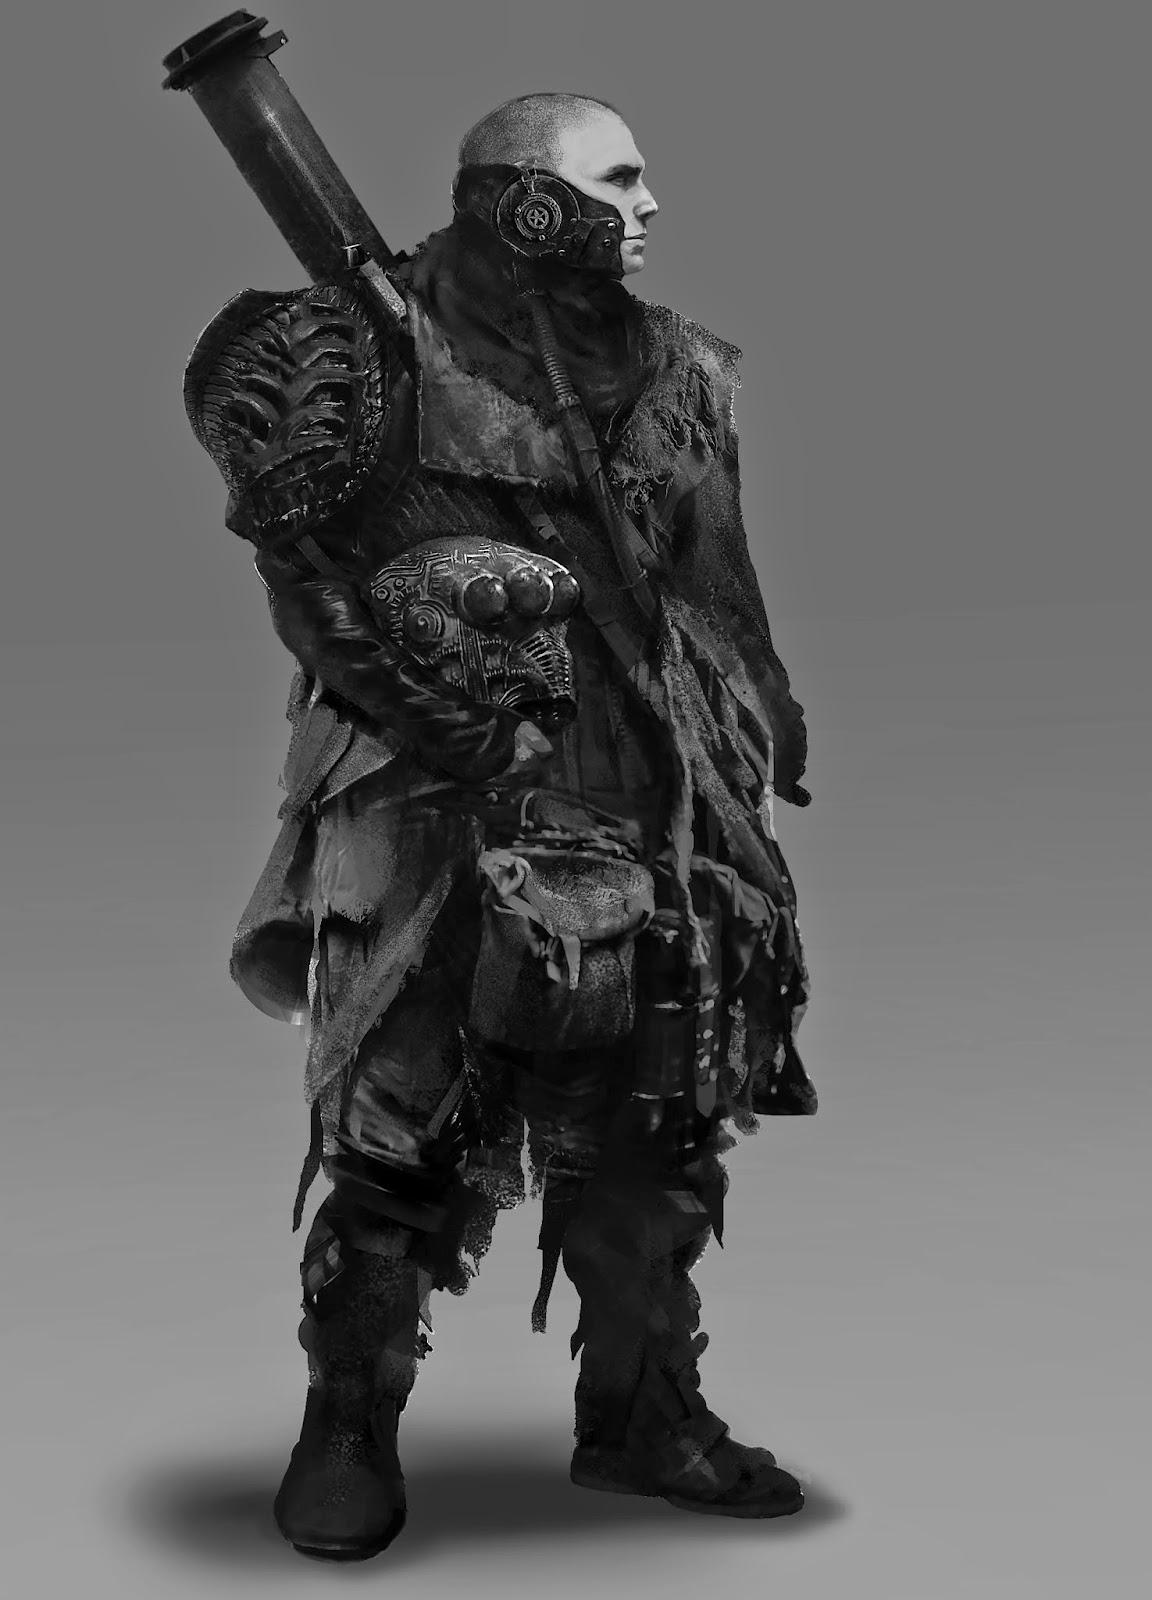 Resistance (Ferral) - Salakahn, Tyrant of Atlantia